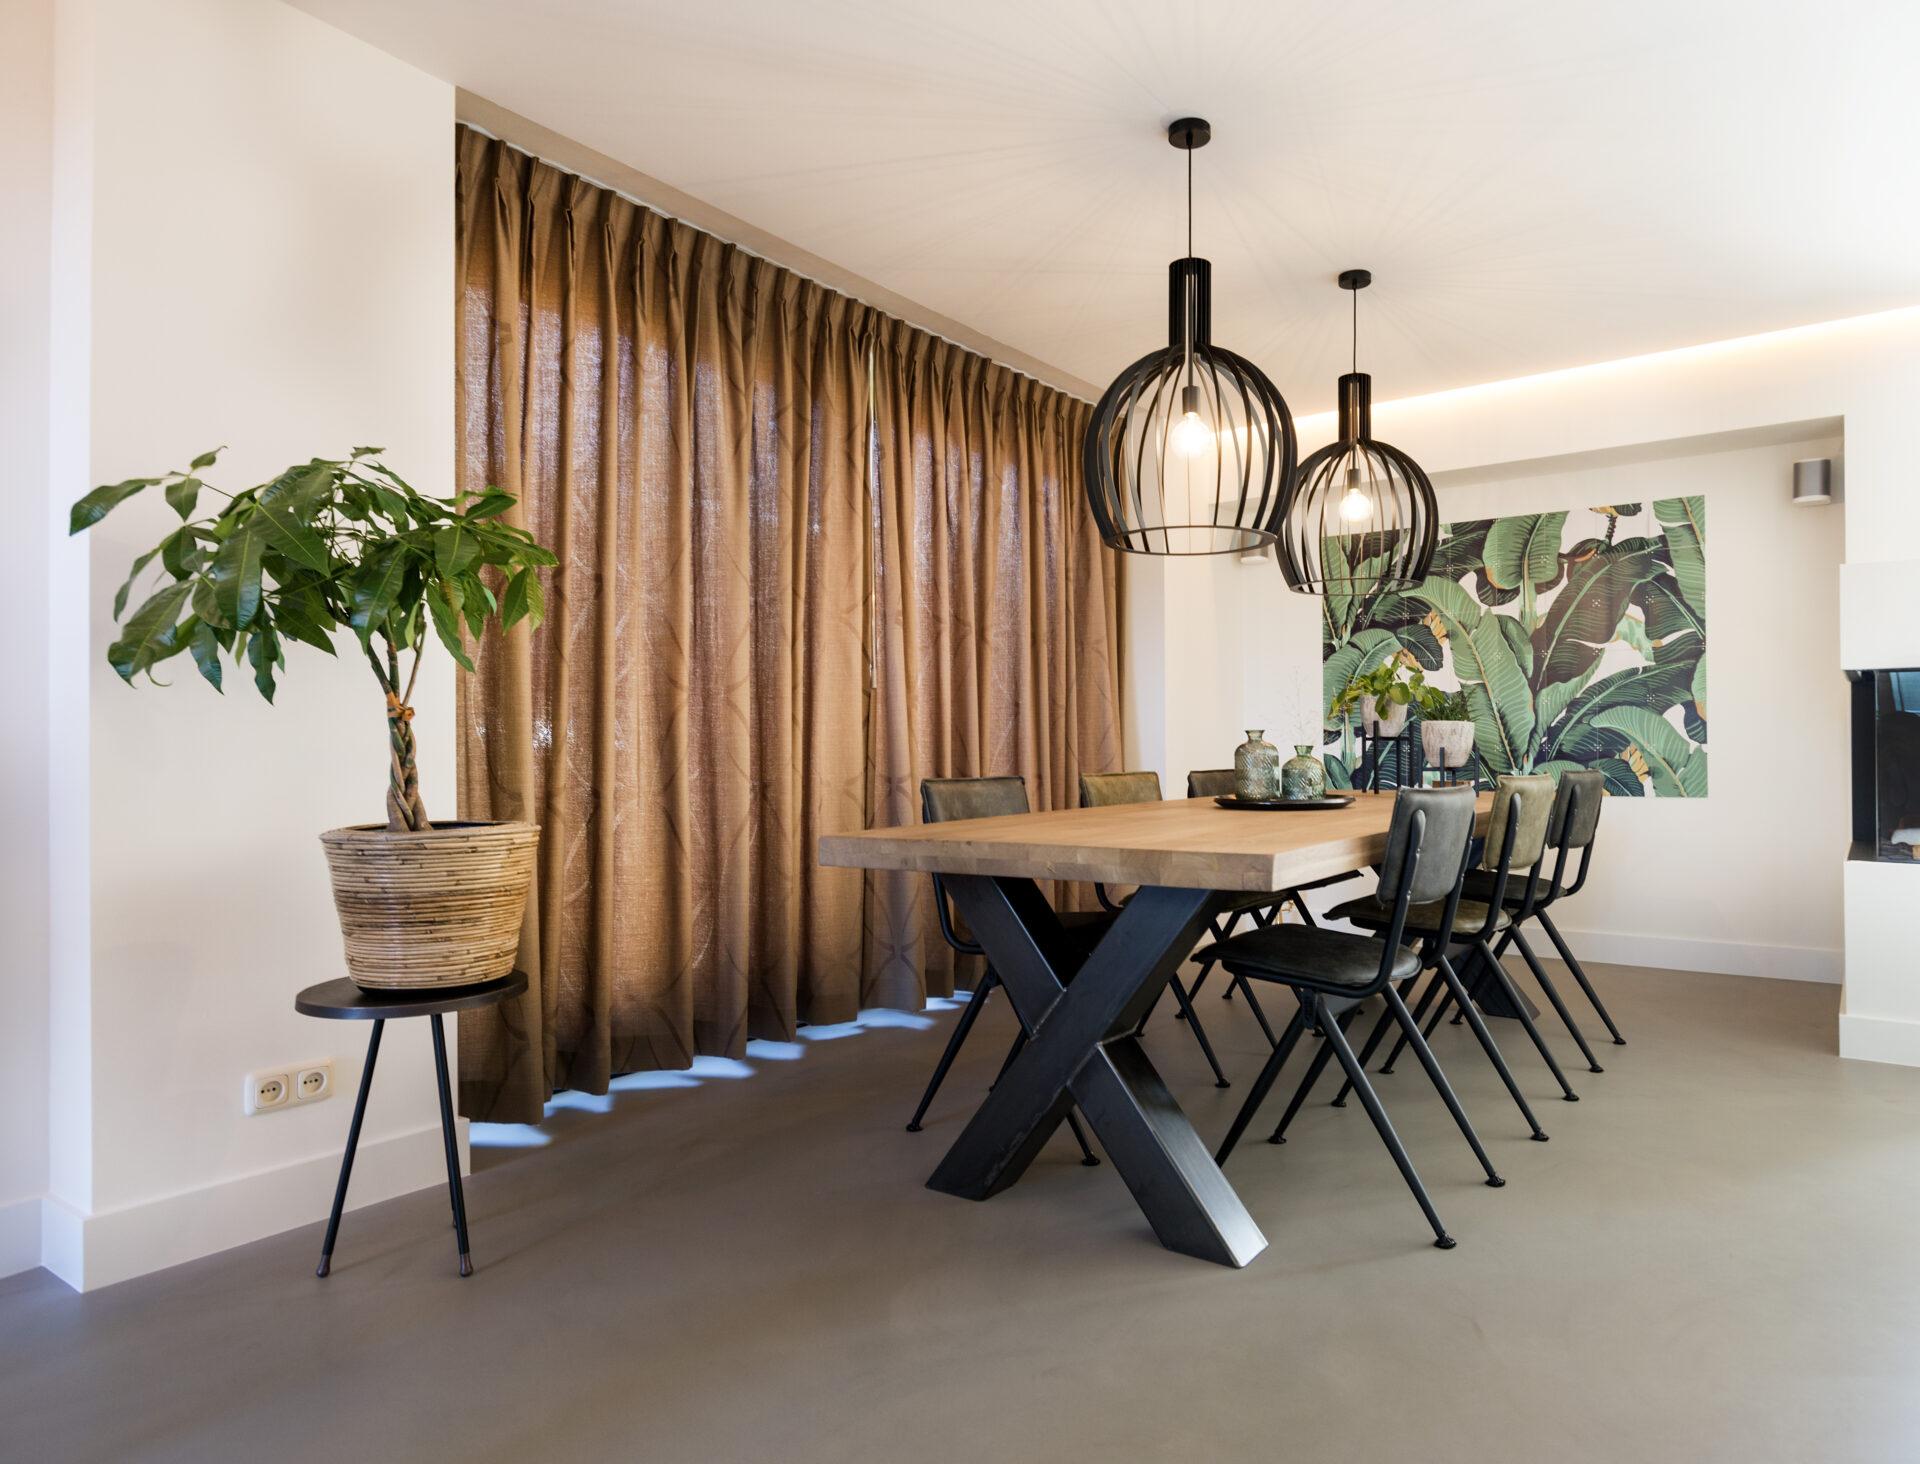 EPI Corestone Classic betonlook vloeren